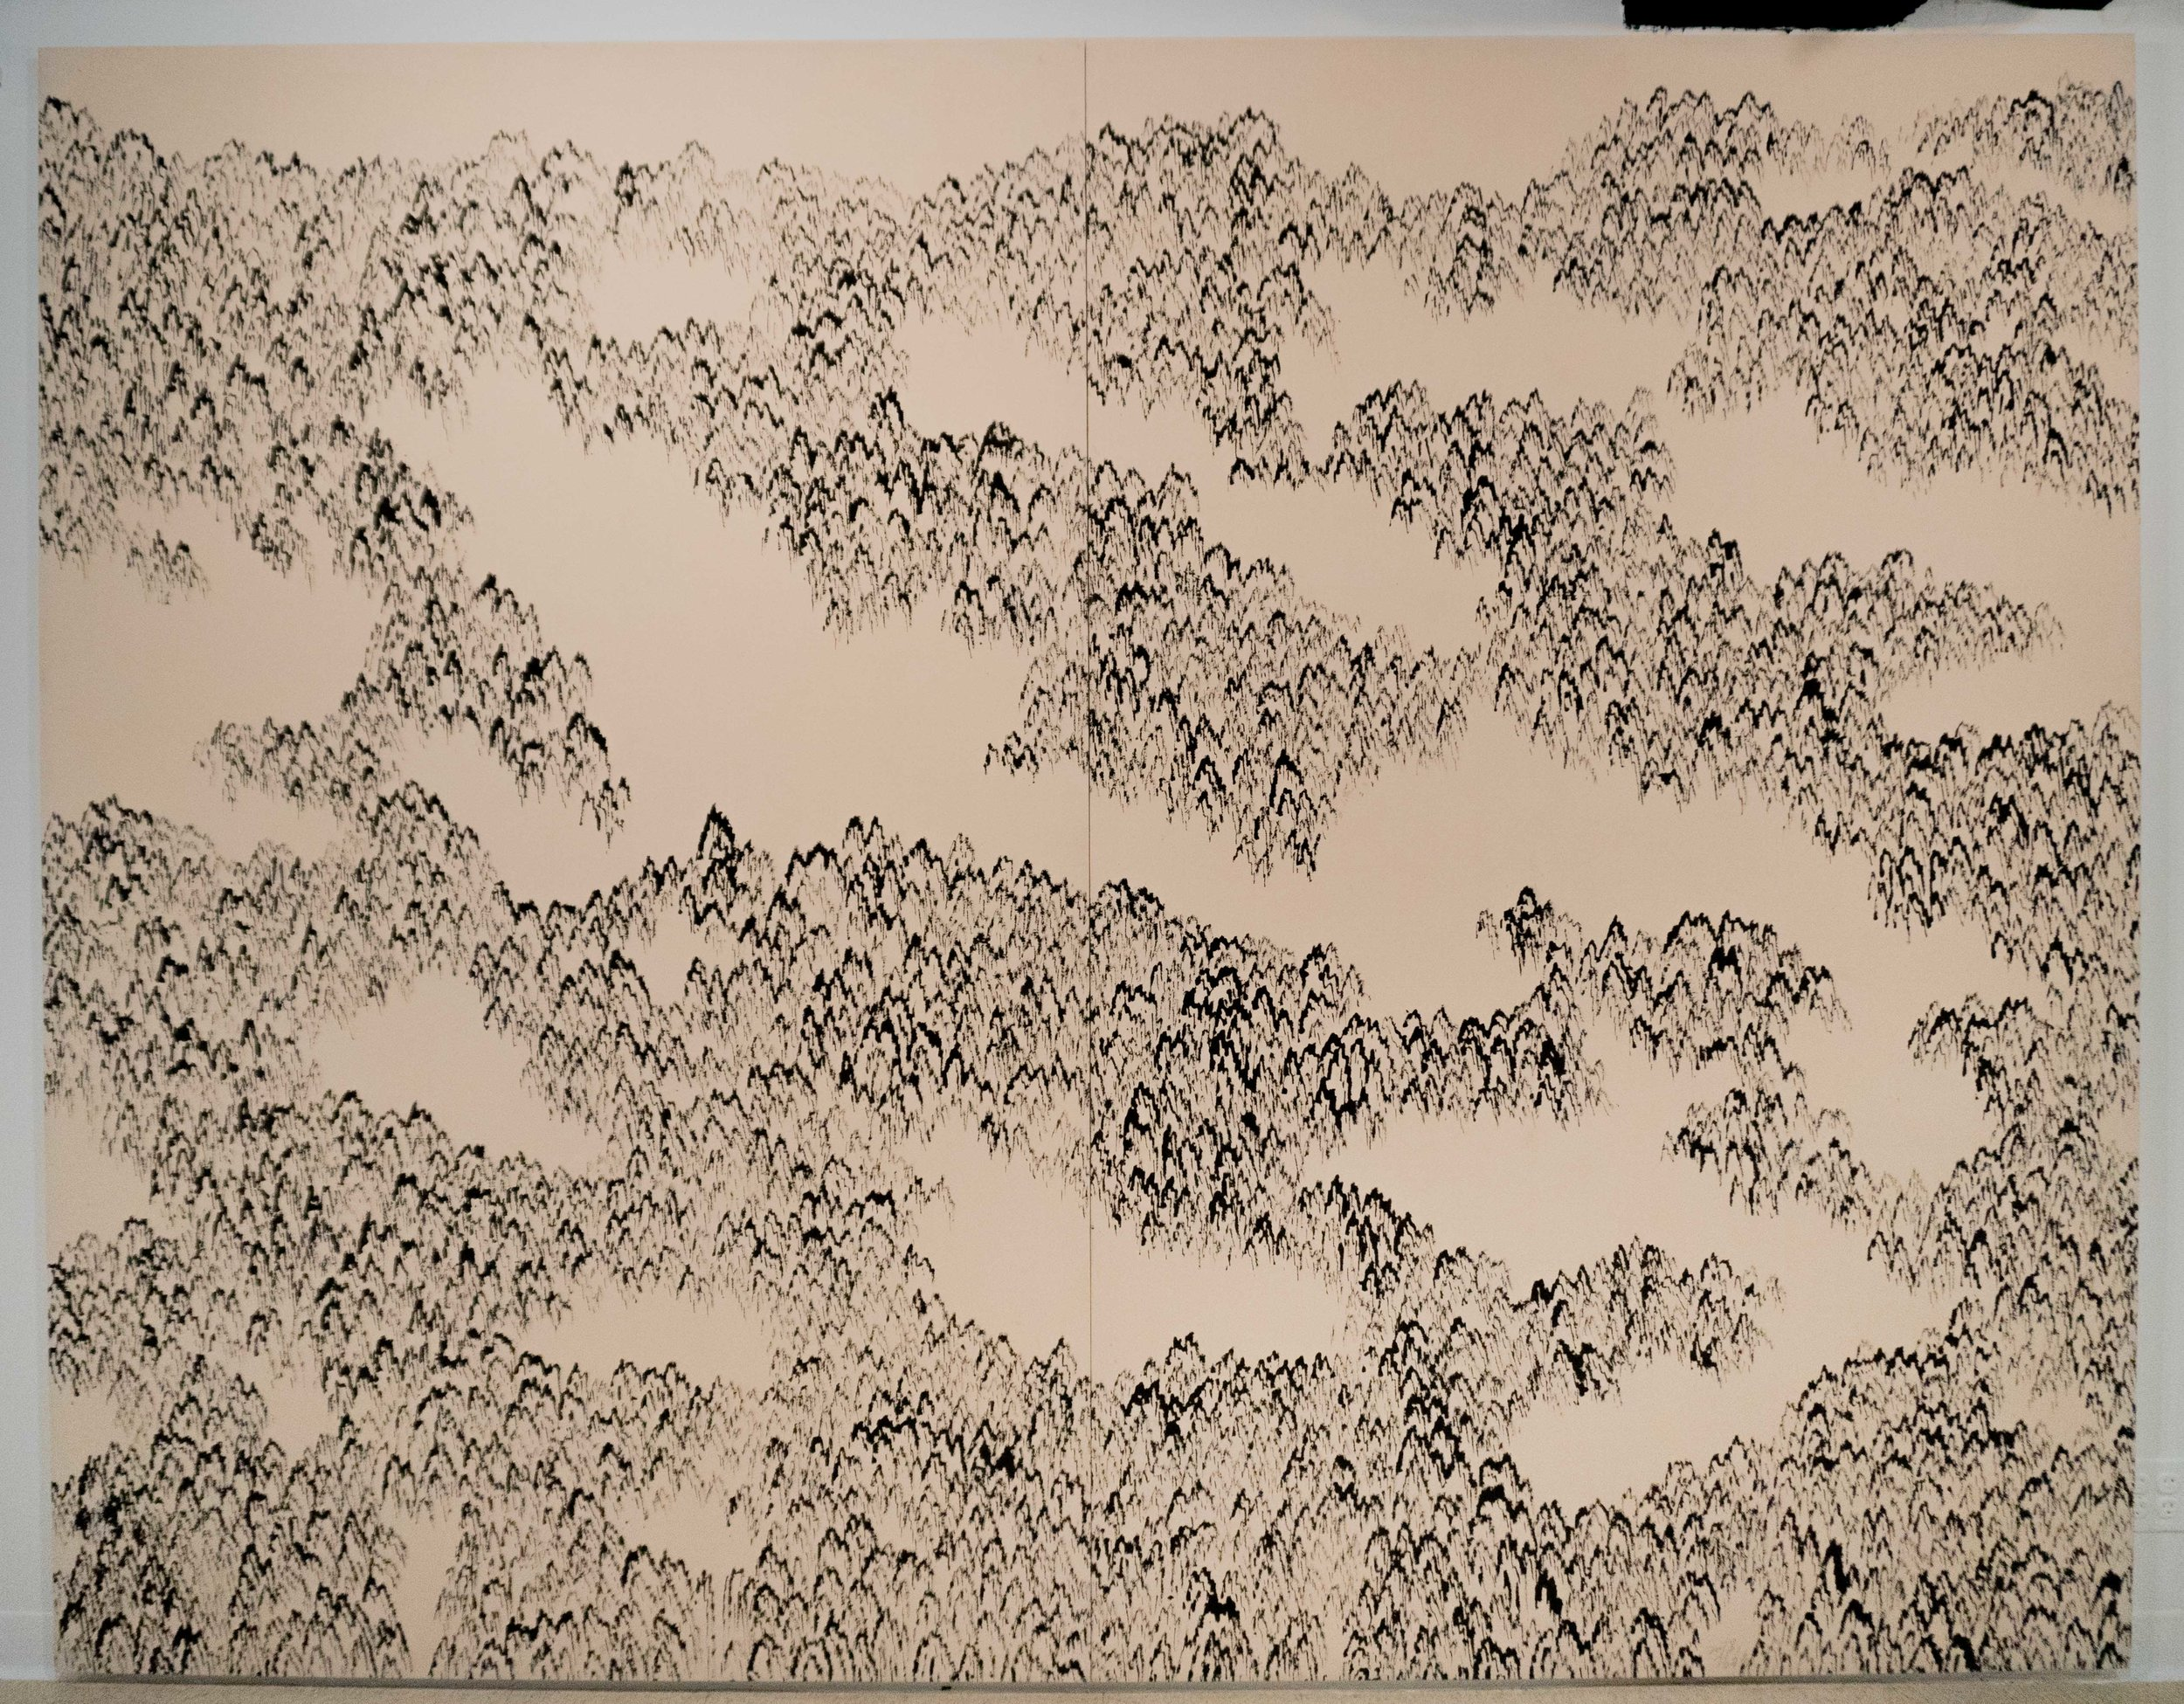 Kim Ho Deuk 김호득 b. 1950   Mountain – Faraway 산-아득 2018 Ink on cotton fabric 99 x 127 in